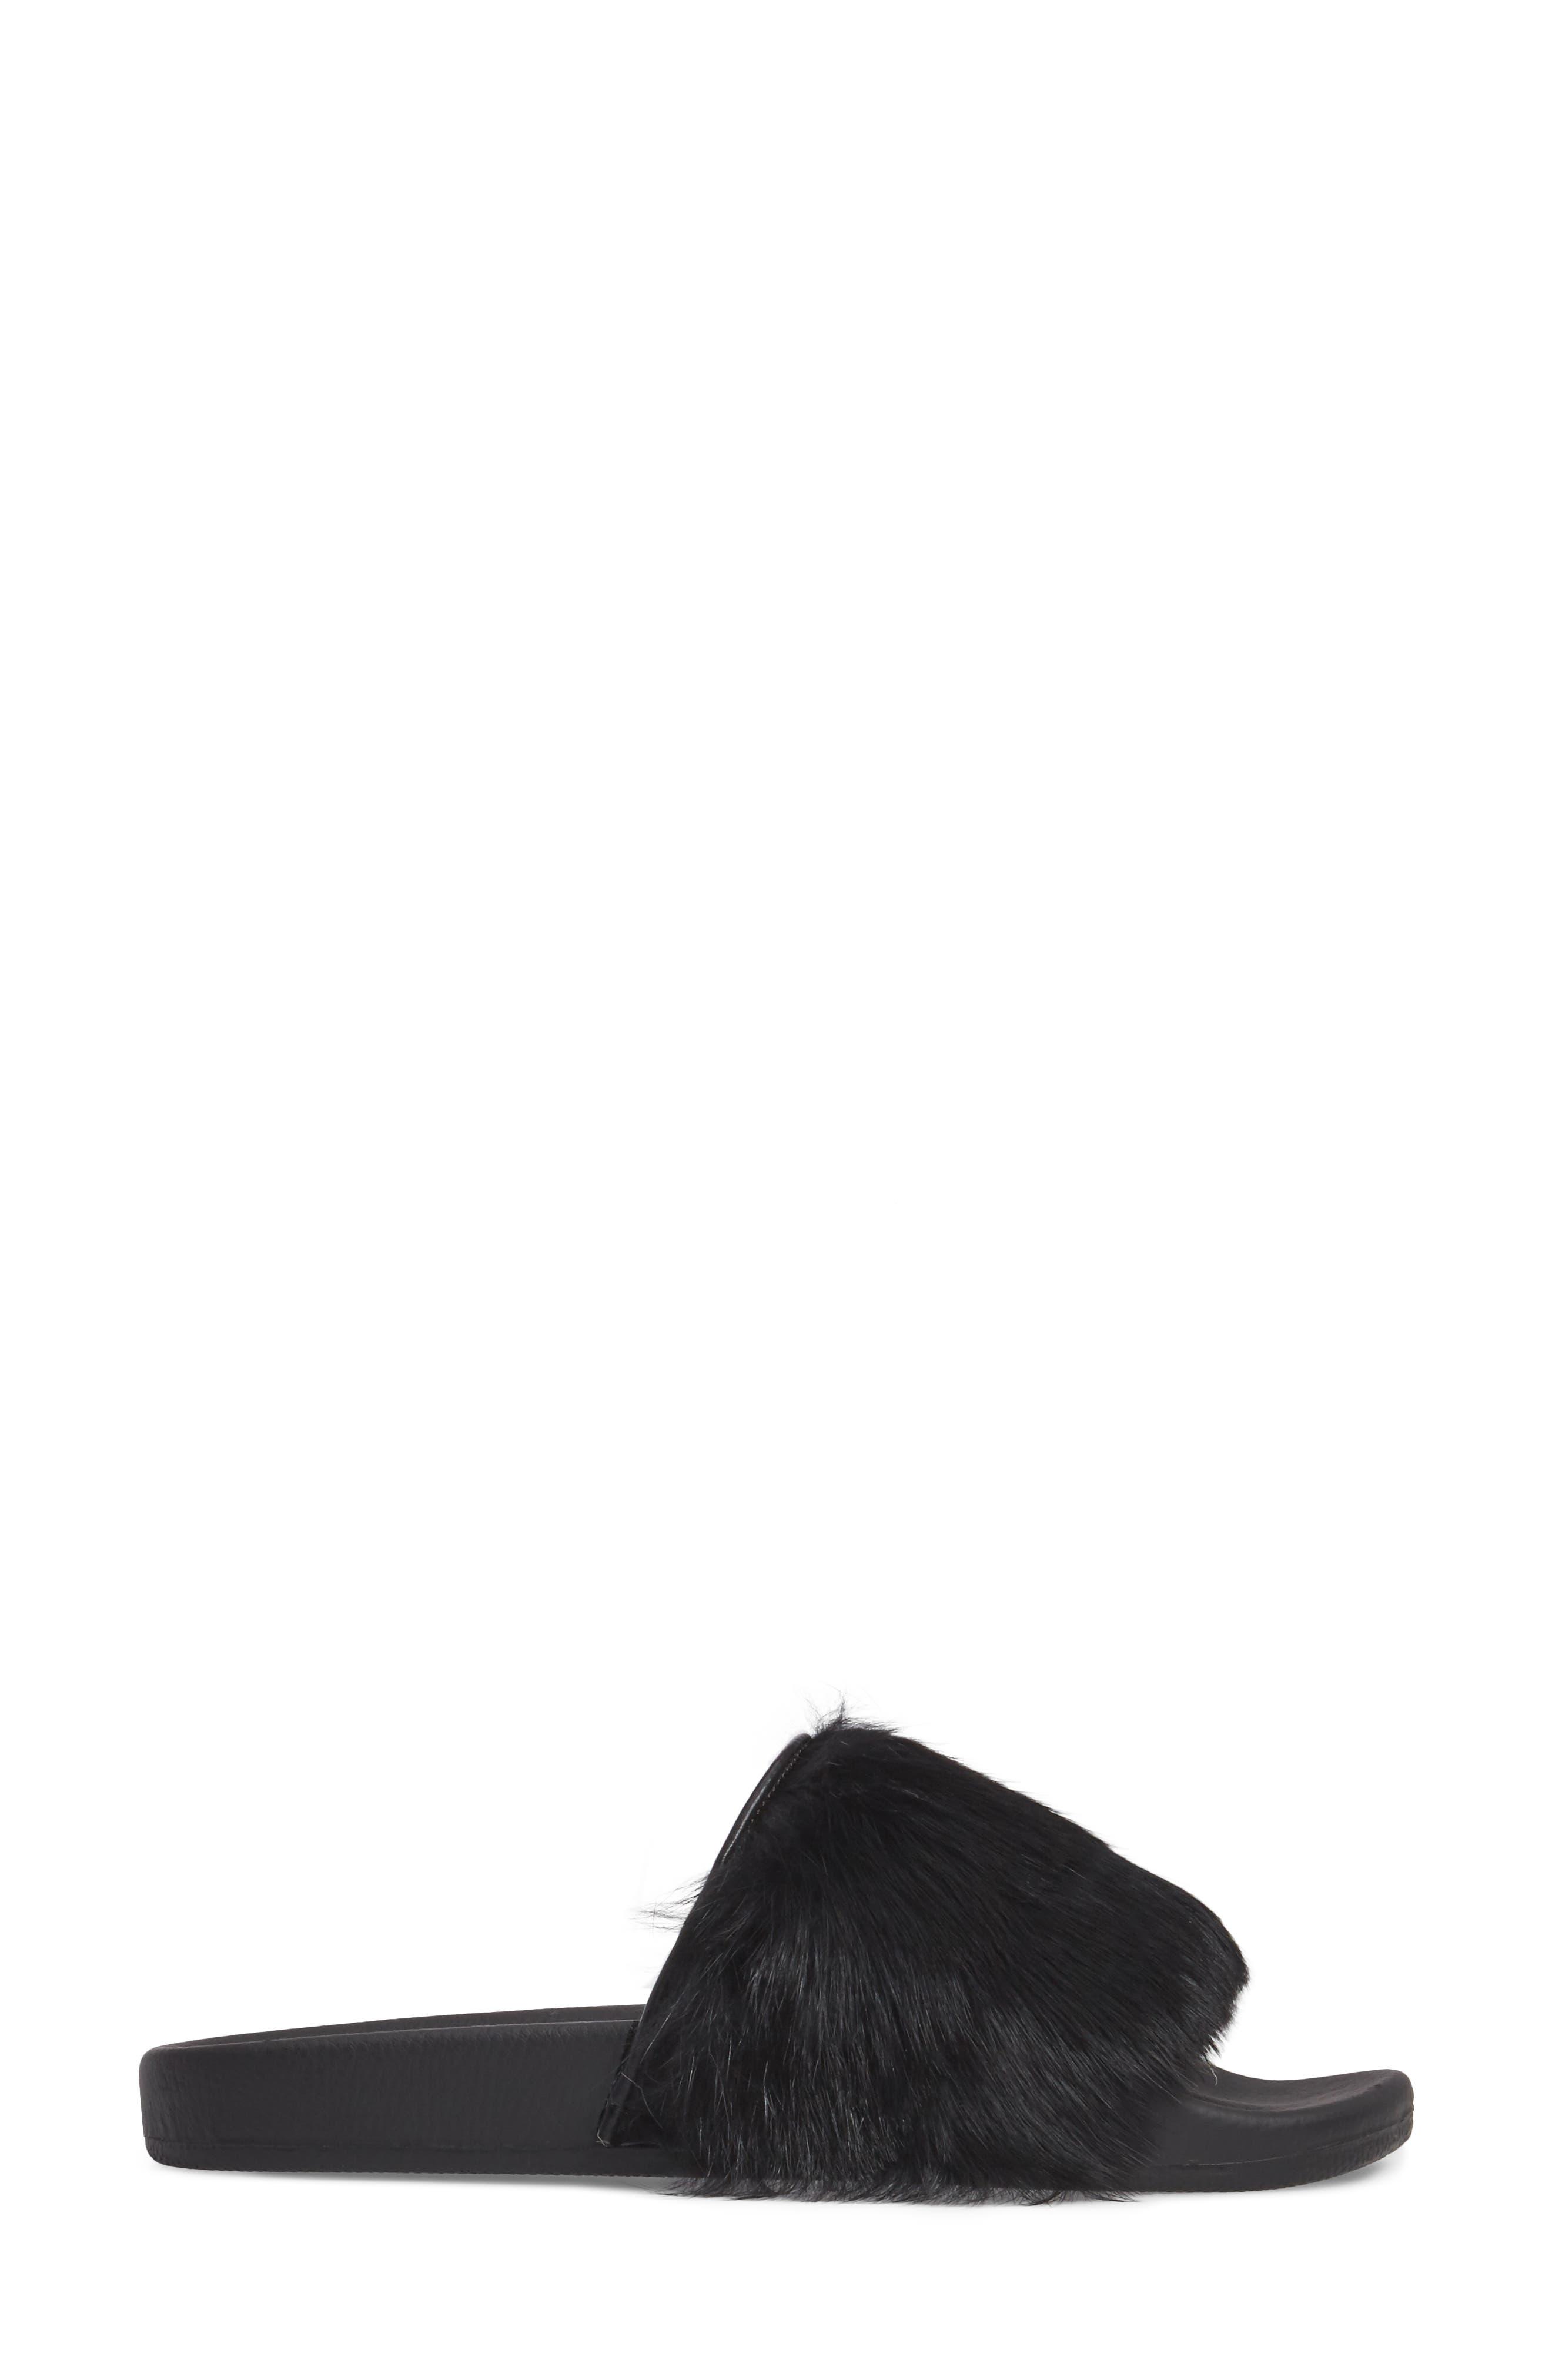 Sammi Genuine Fur Slide Sandal,                             Alternate thumbnail 3, color,                             001